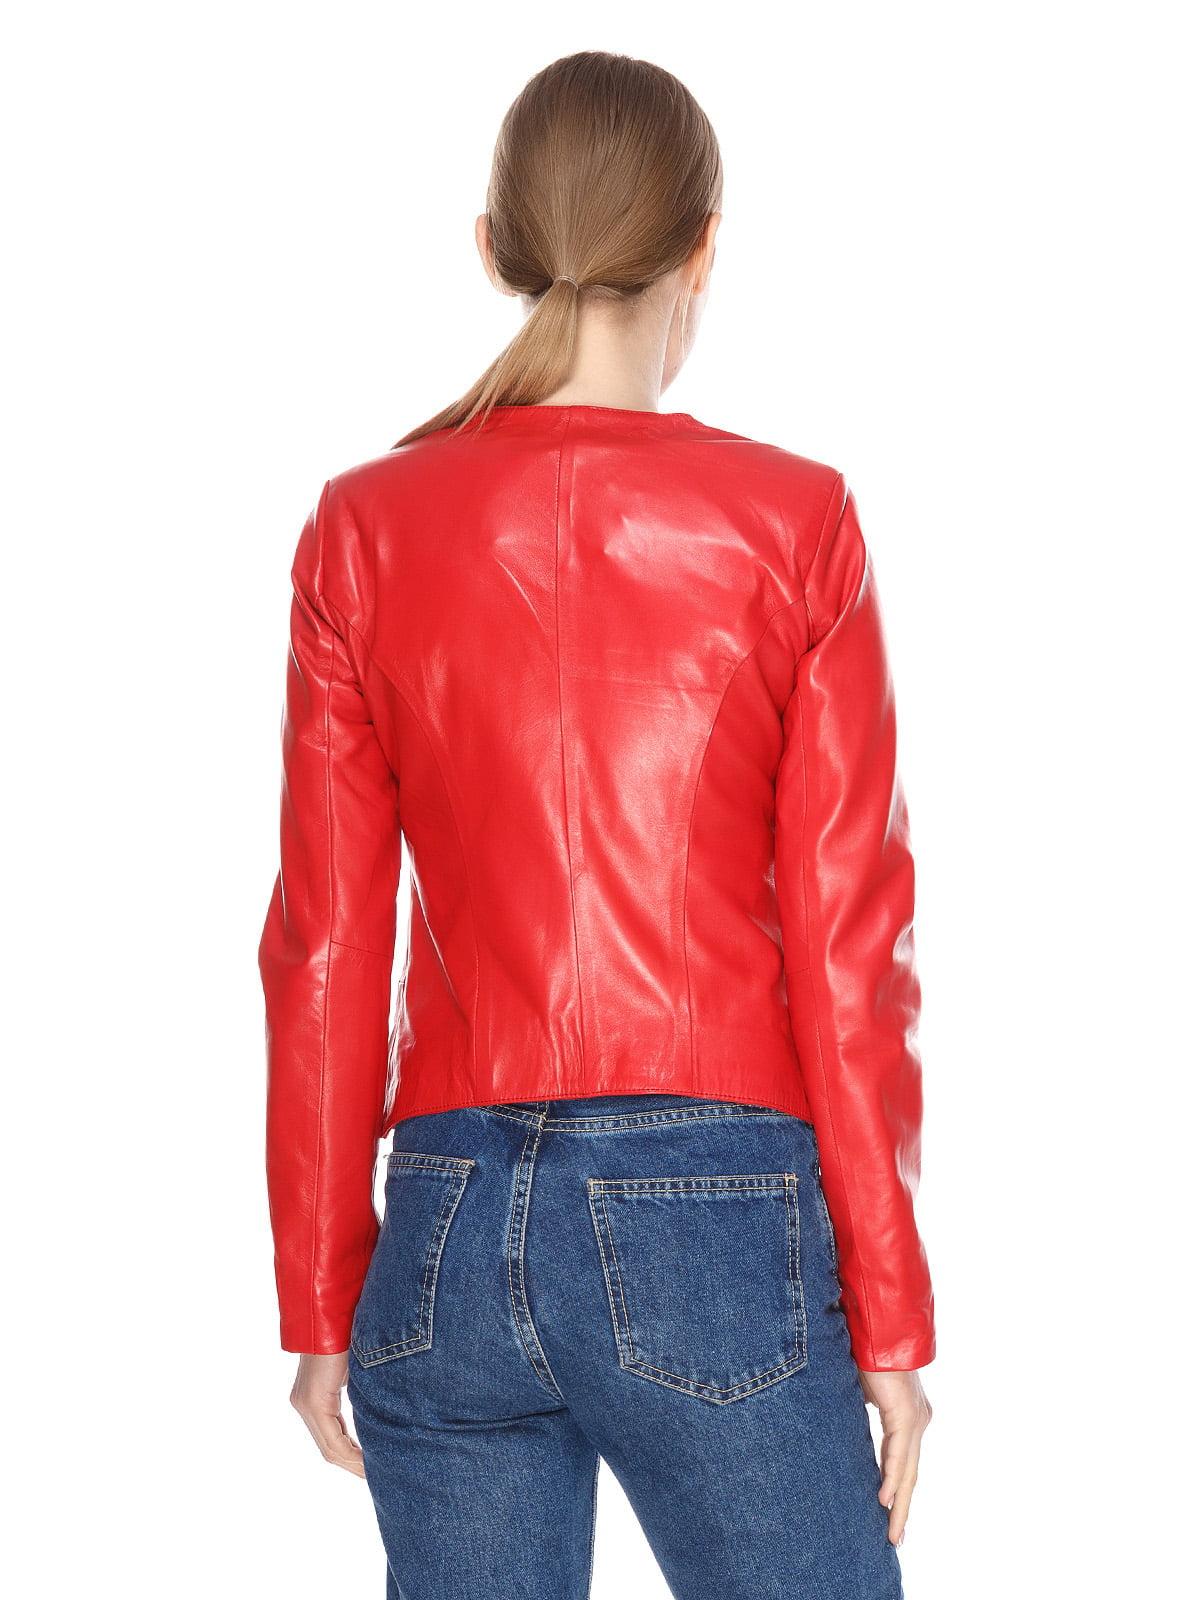 Куртка червона   4191405   фото 2